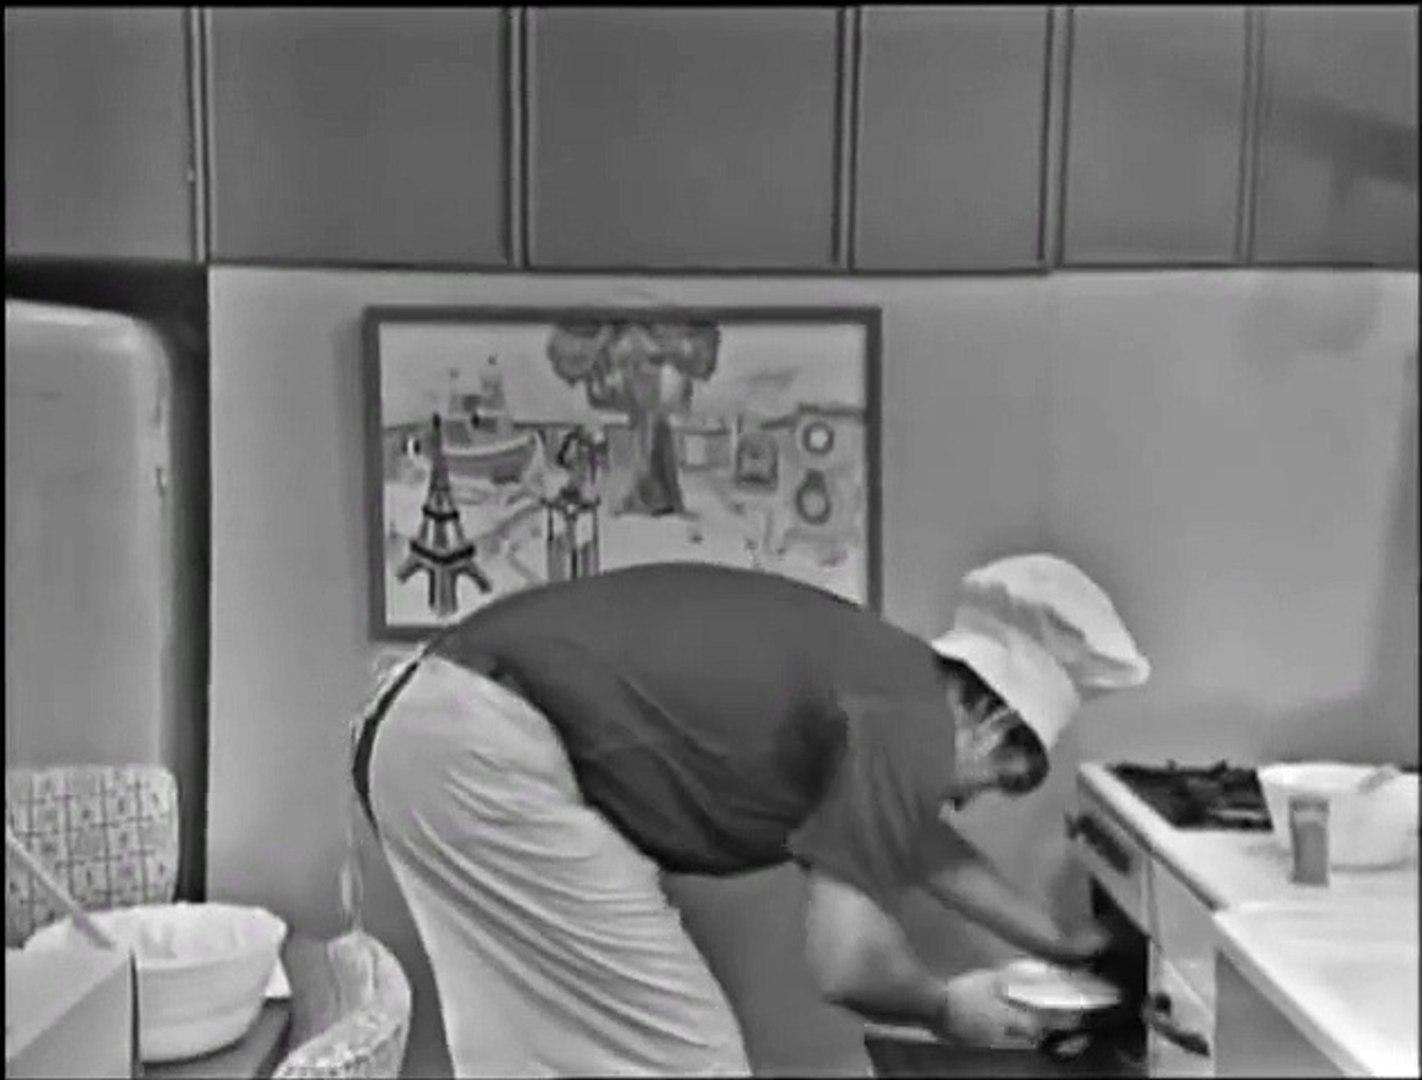 Mister Rogers' Neighborhood S01E003 #3 Chef Brockett Bakes a Cake Fit for a  King (1967) Black & White